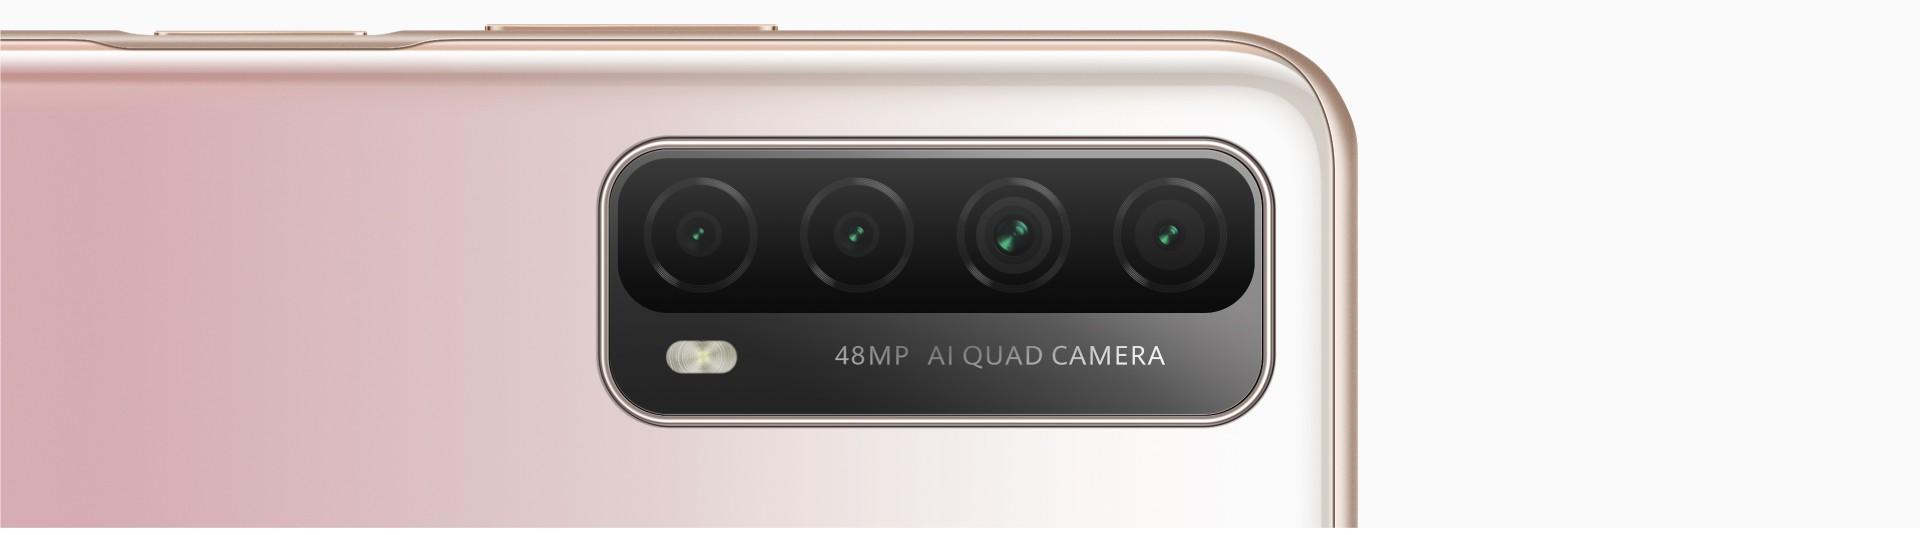 Huawei Y7a + Quad Ai Cameras